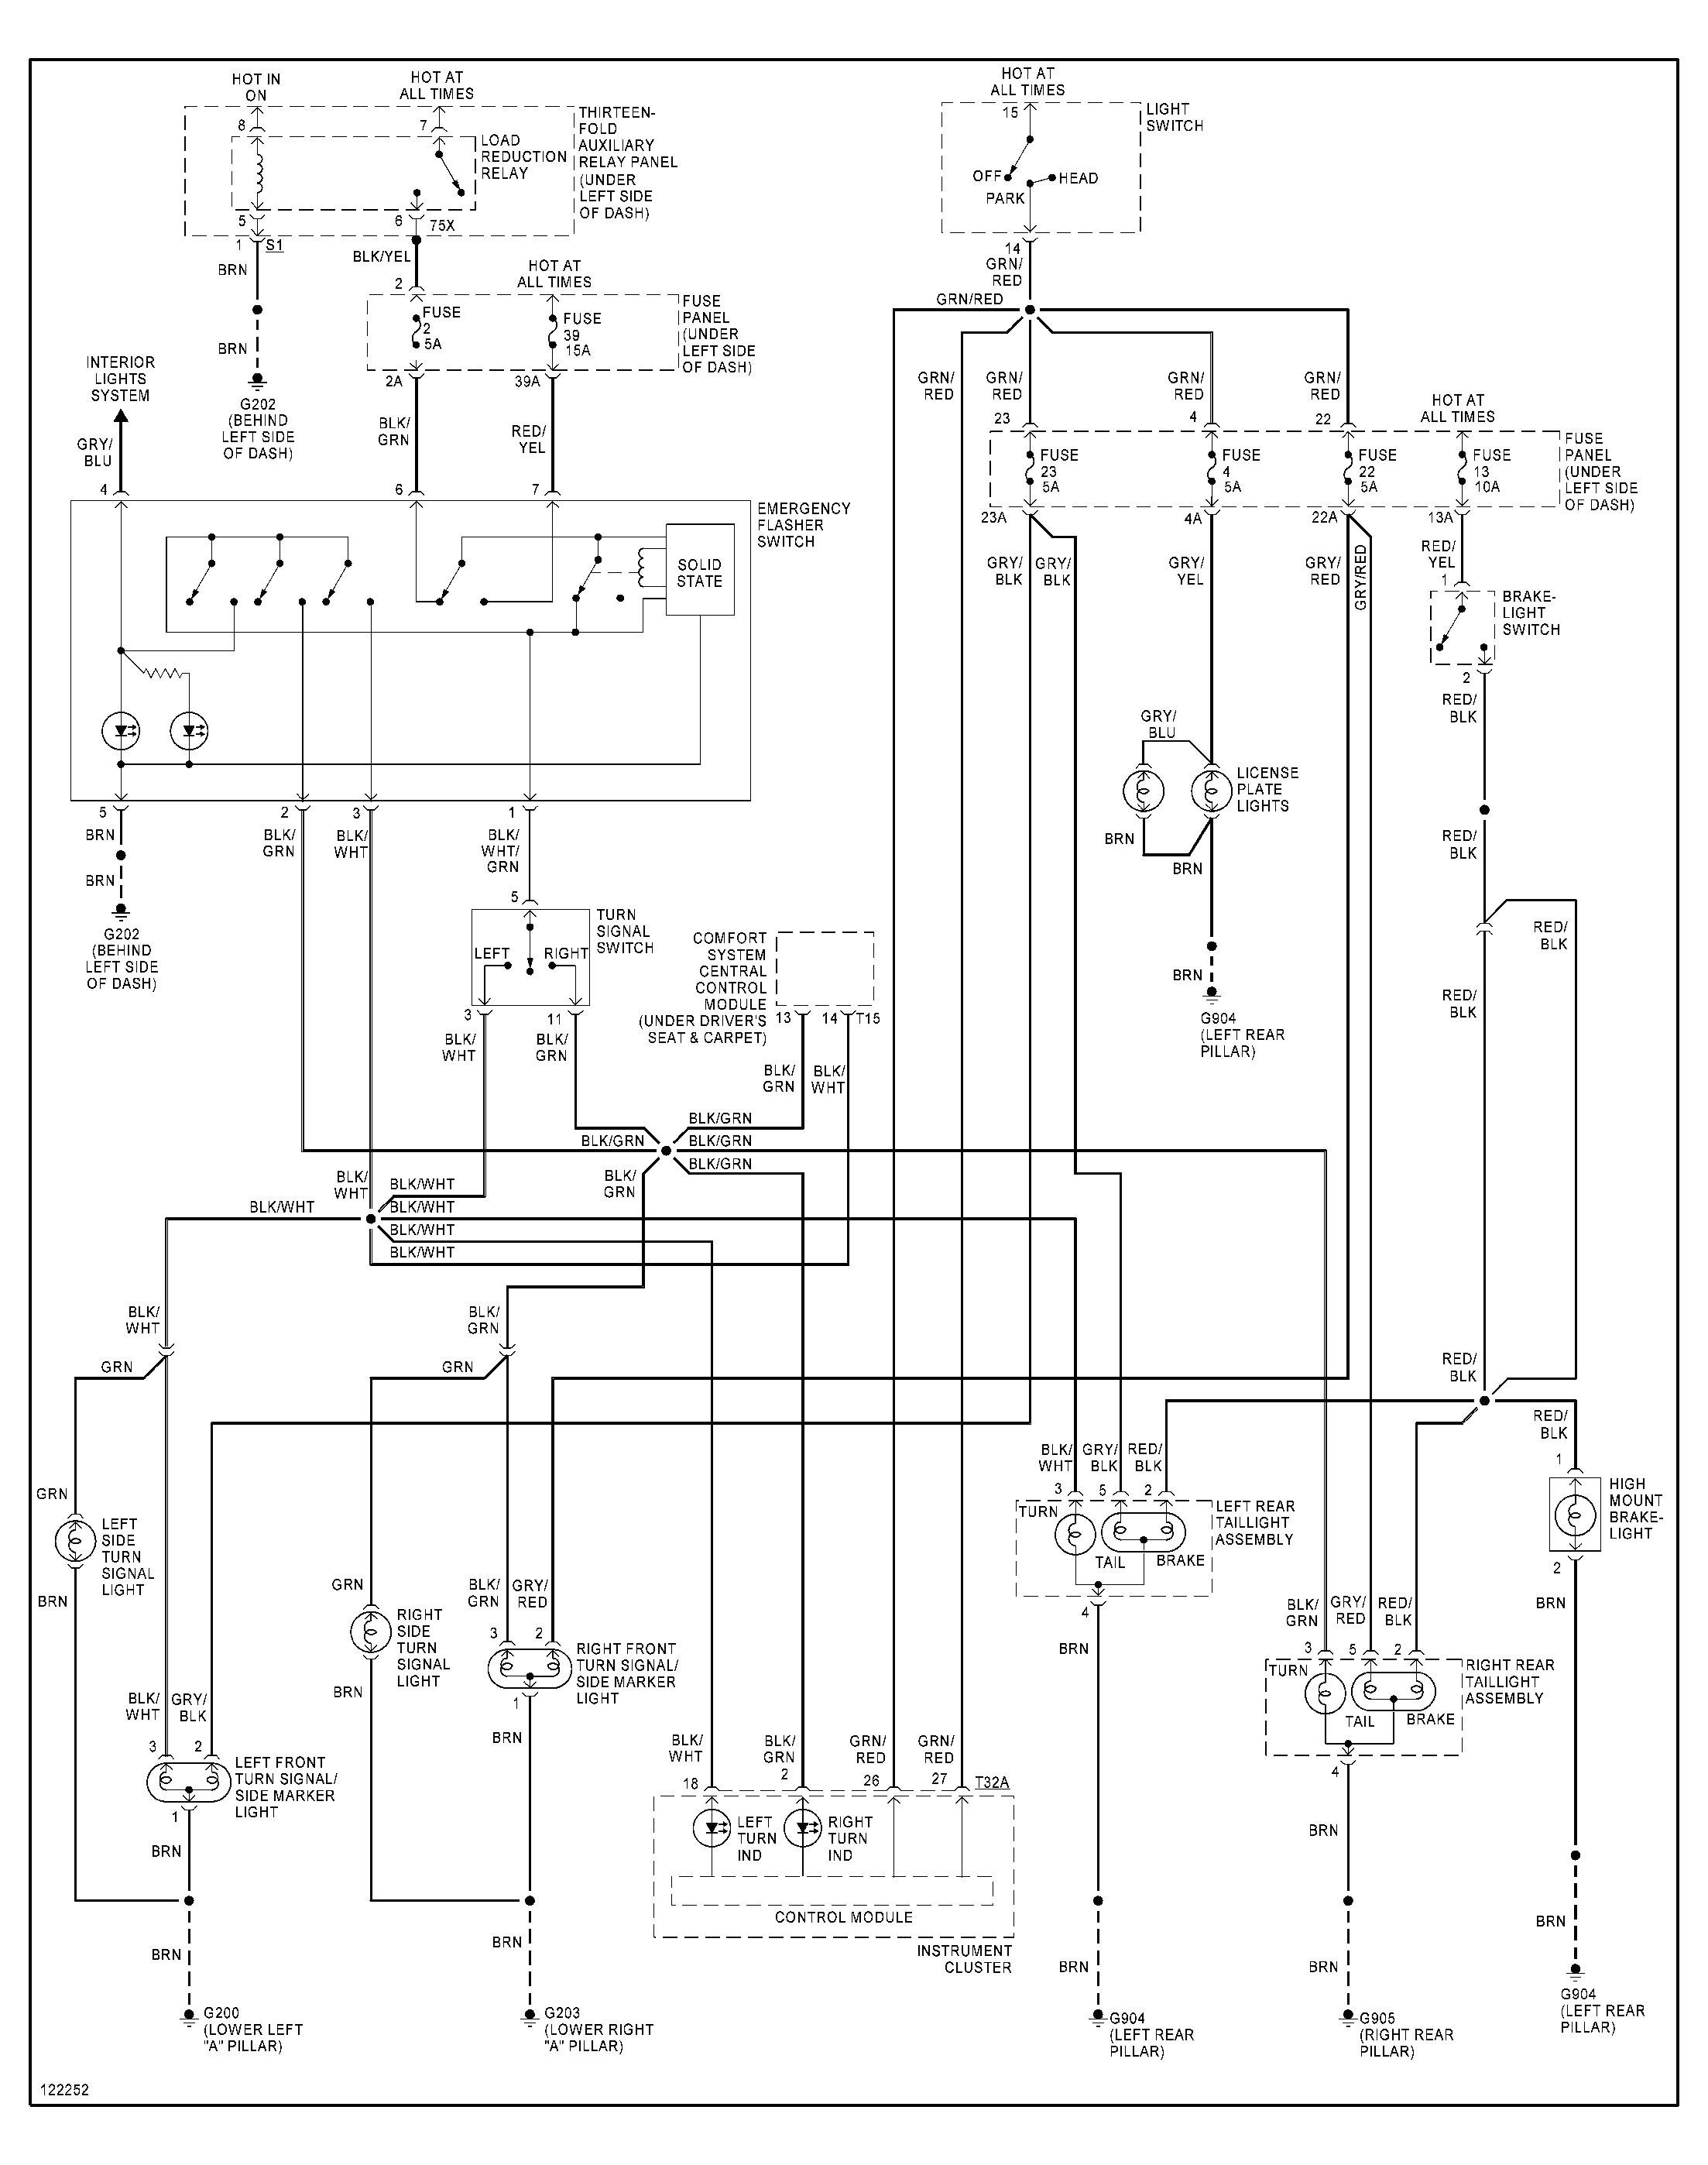 1989 vw cabriolet wiring diagram radio wiring diagram tools 1989 volkswagen cabriolet wiring diagram wiring diagram